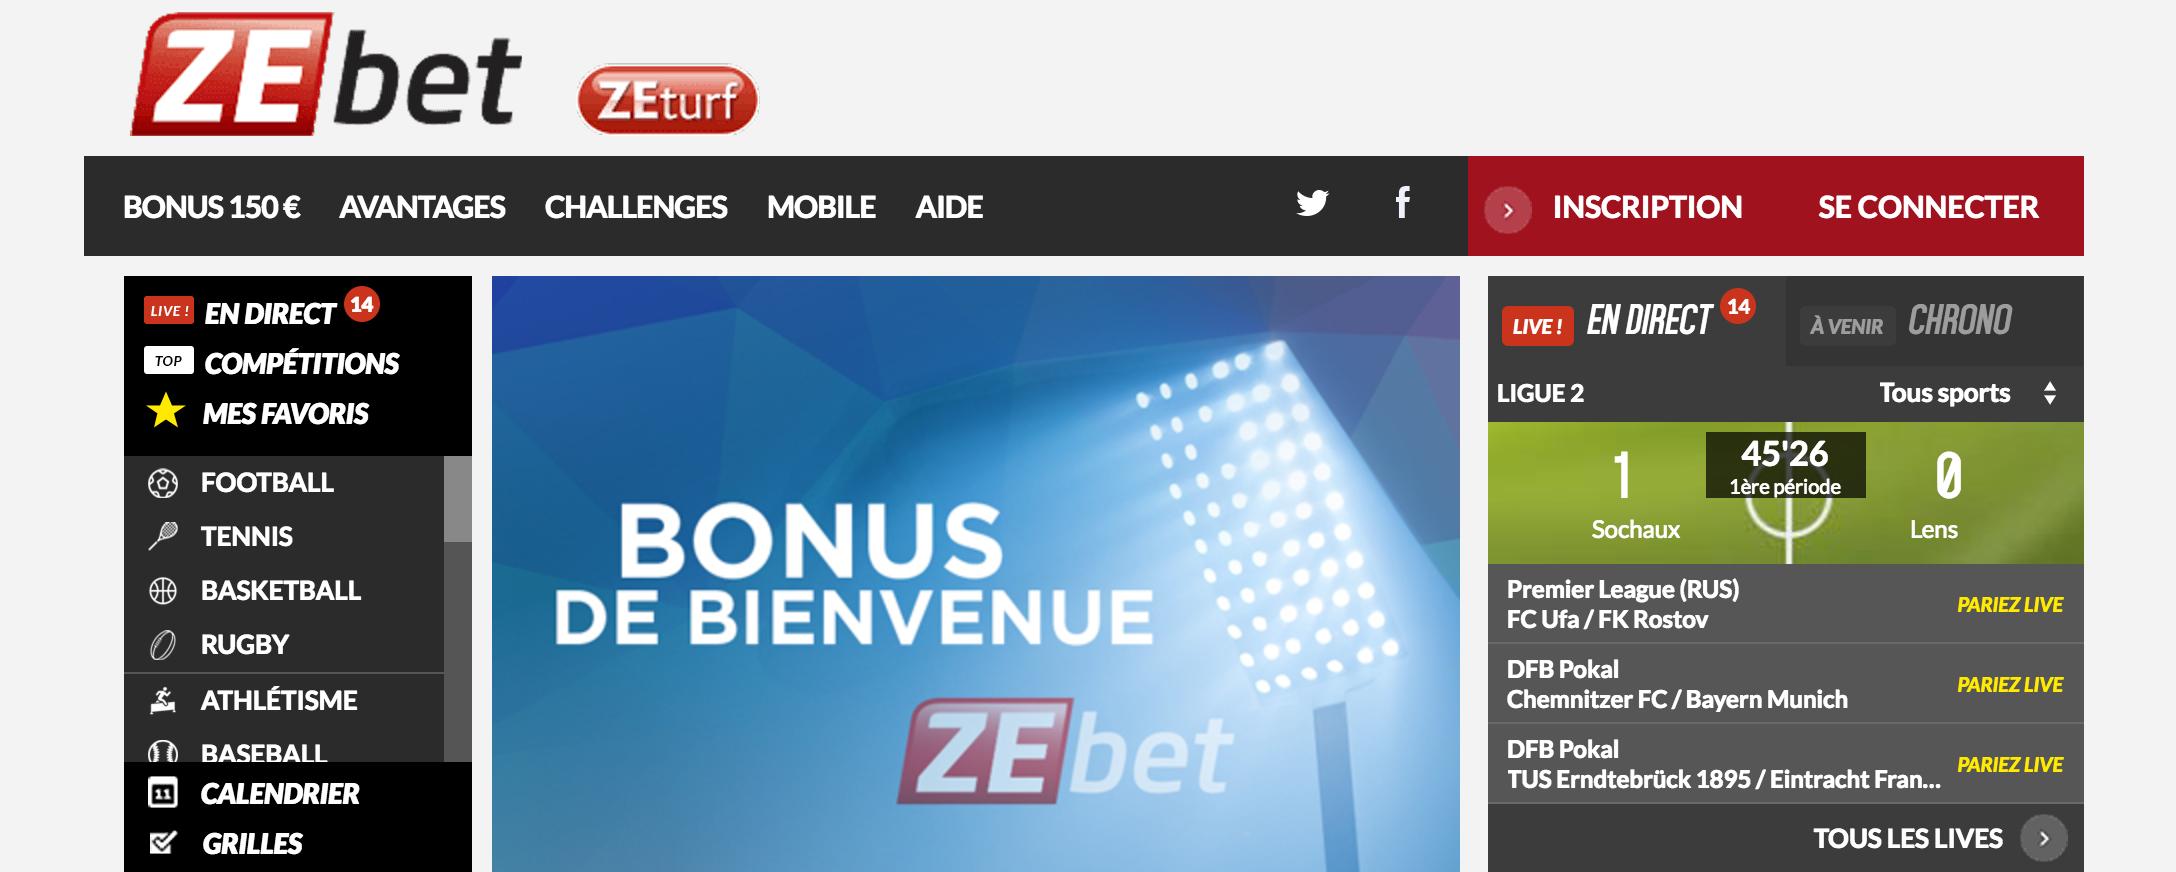 zebet bonus - Bonus Zebet